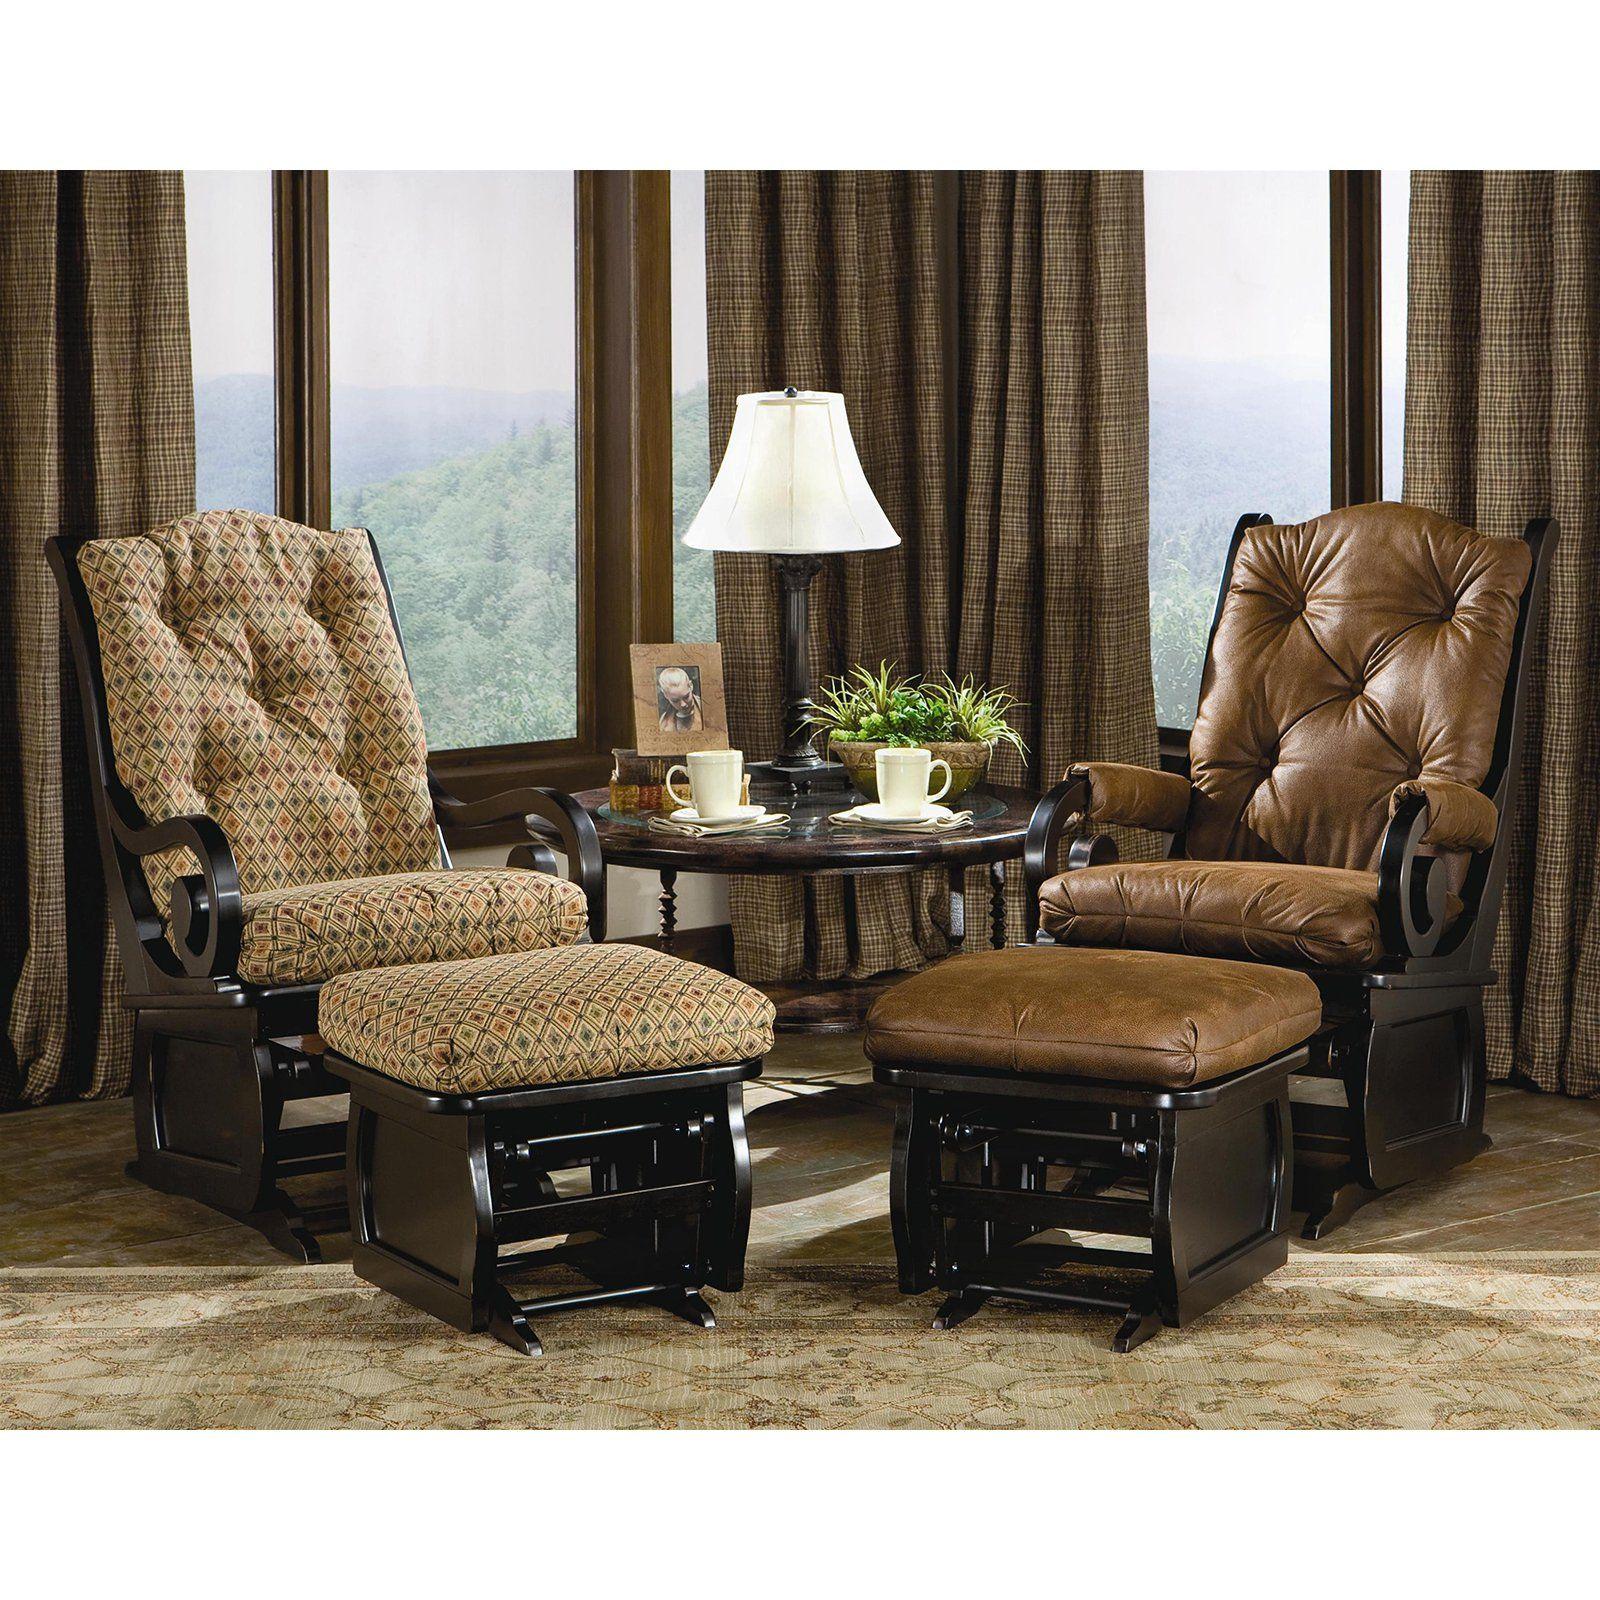 Brooks Furniture Patriot Glider Rocker | from hayneedle ... on Patriot Outdoor Living id=89205